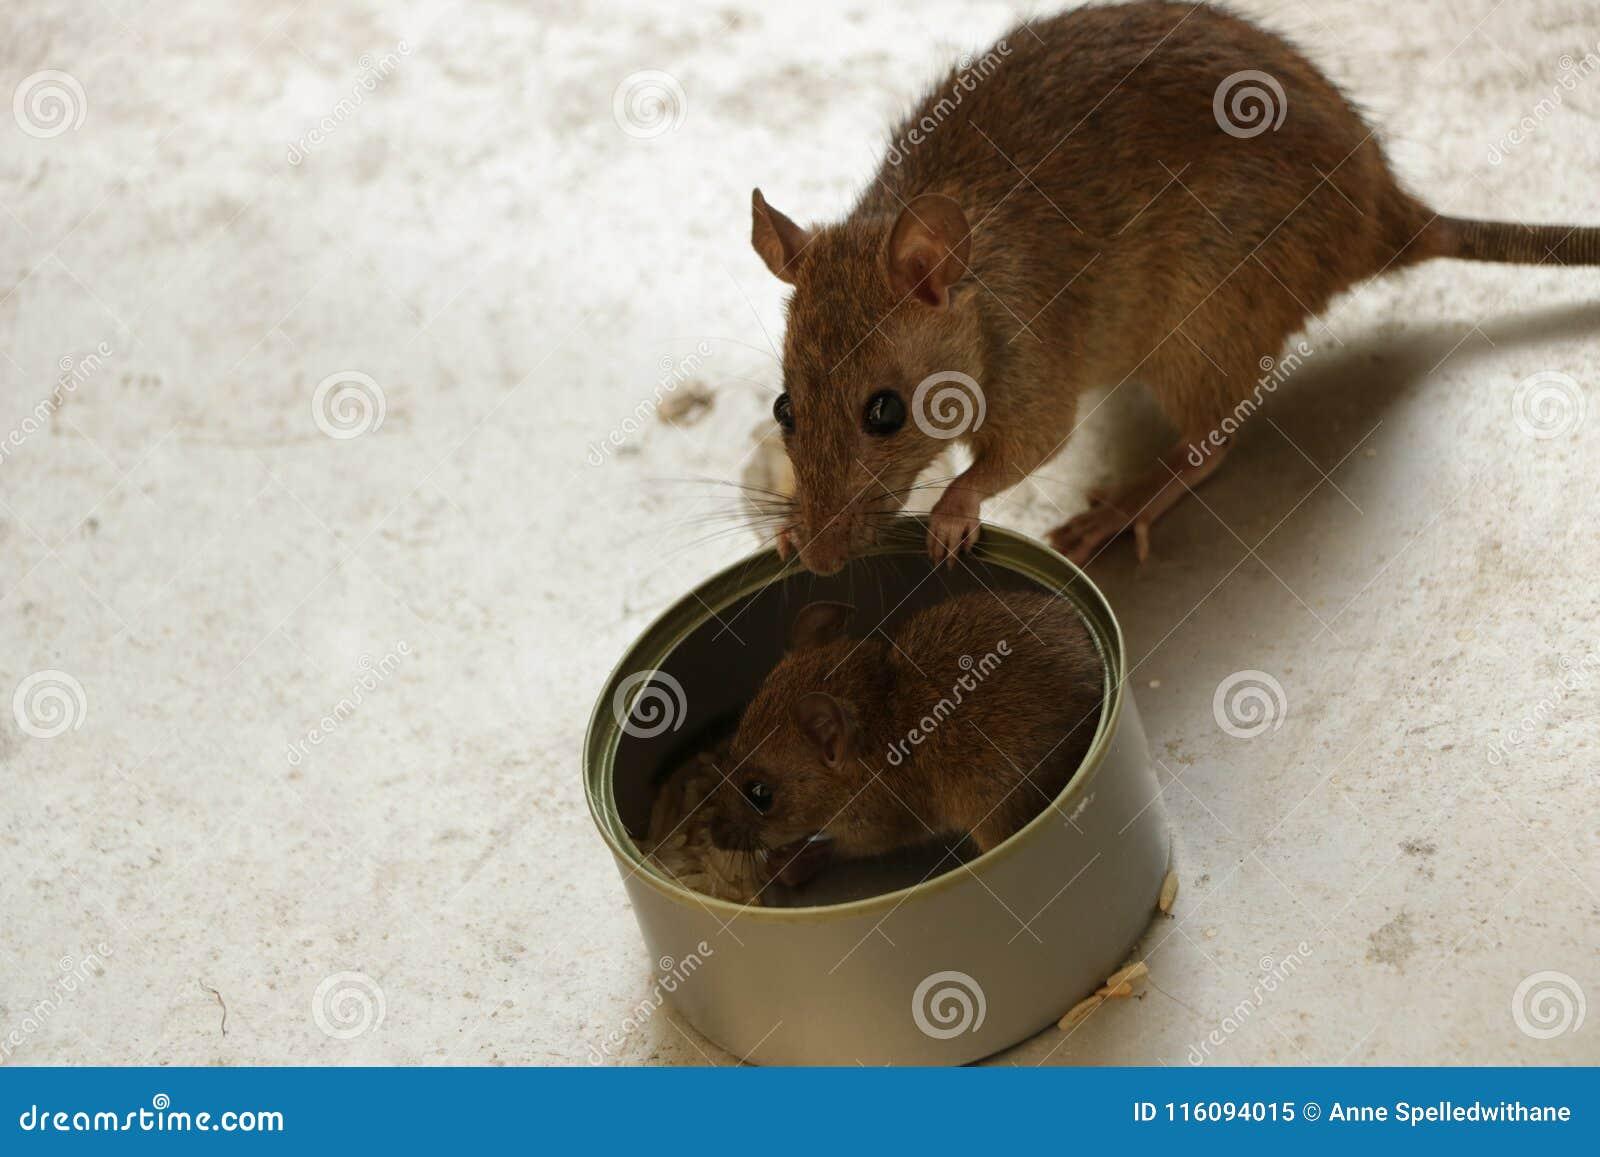 d3e15db3dabb Χαριτωμένο μικροσκοπικό ποντίκι μωρών που τρώει το ρύζι στο δοχείο  κασσίτερου χάλυβα στη στέγη